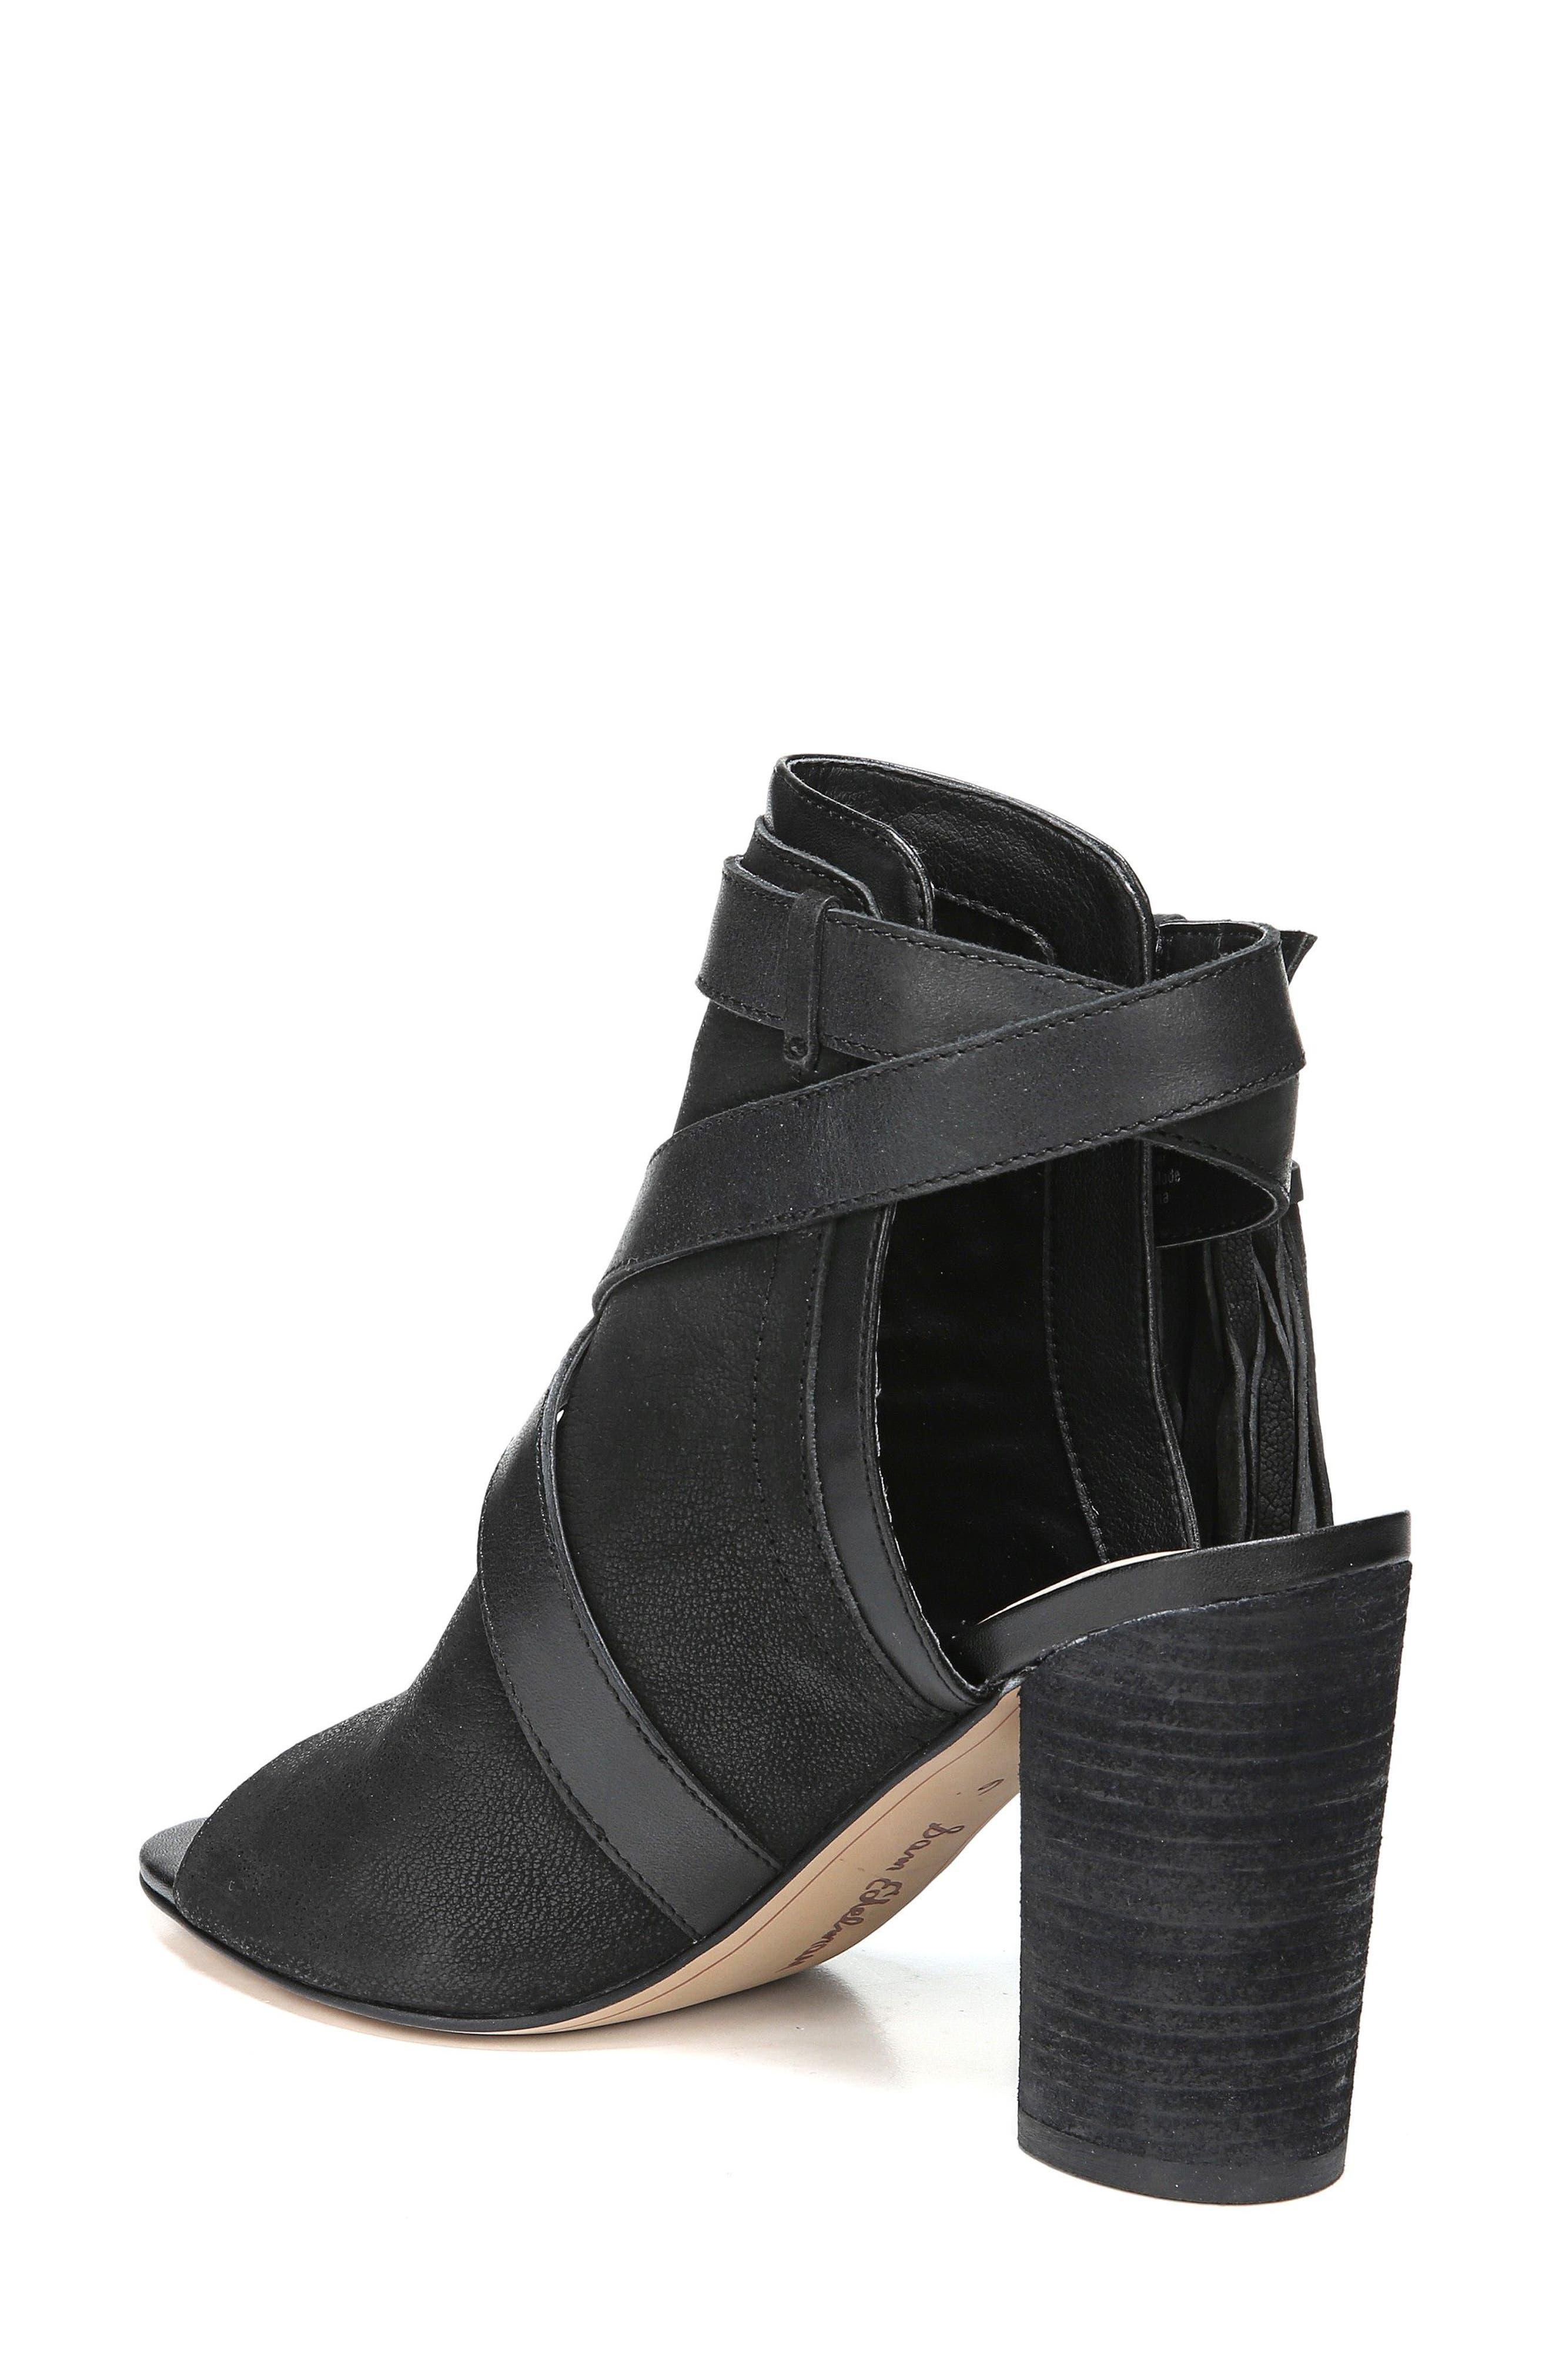 Vermont Block Heel Sandal,                             Alternate thumbnail 2, color,                             001